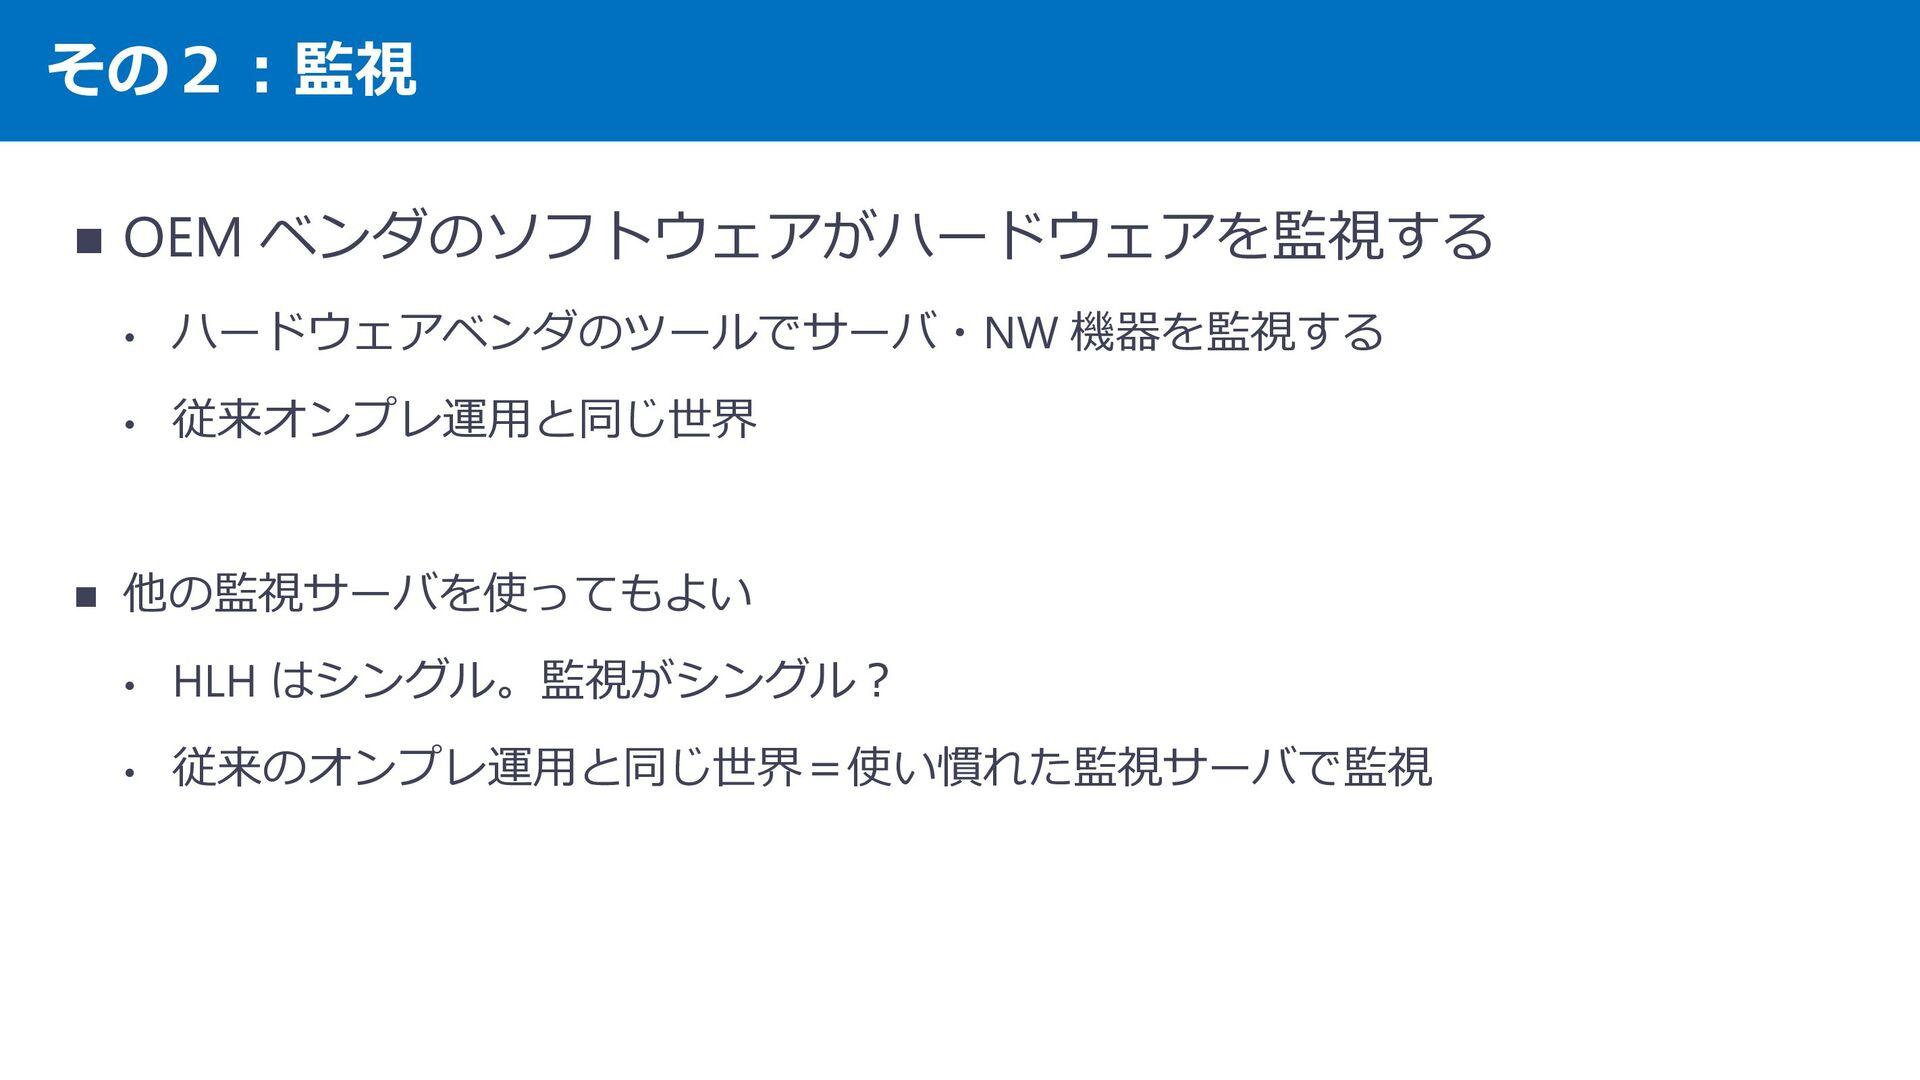 Azure Stack 運⽤その3 障害対応